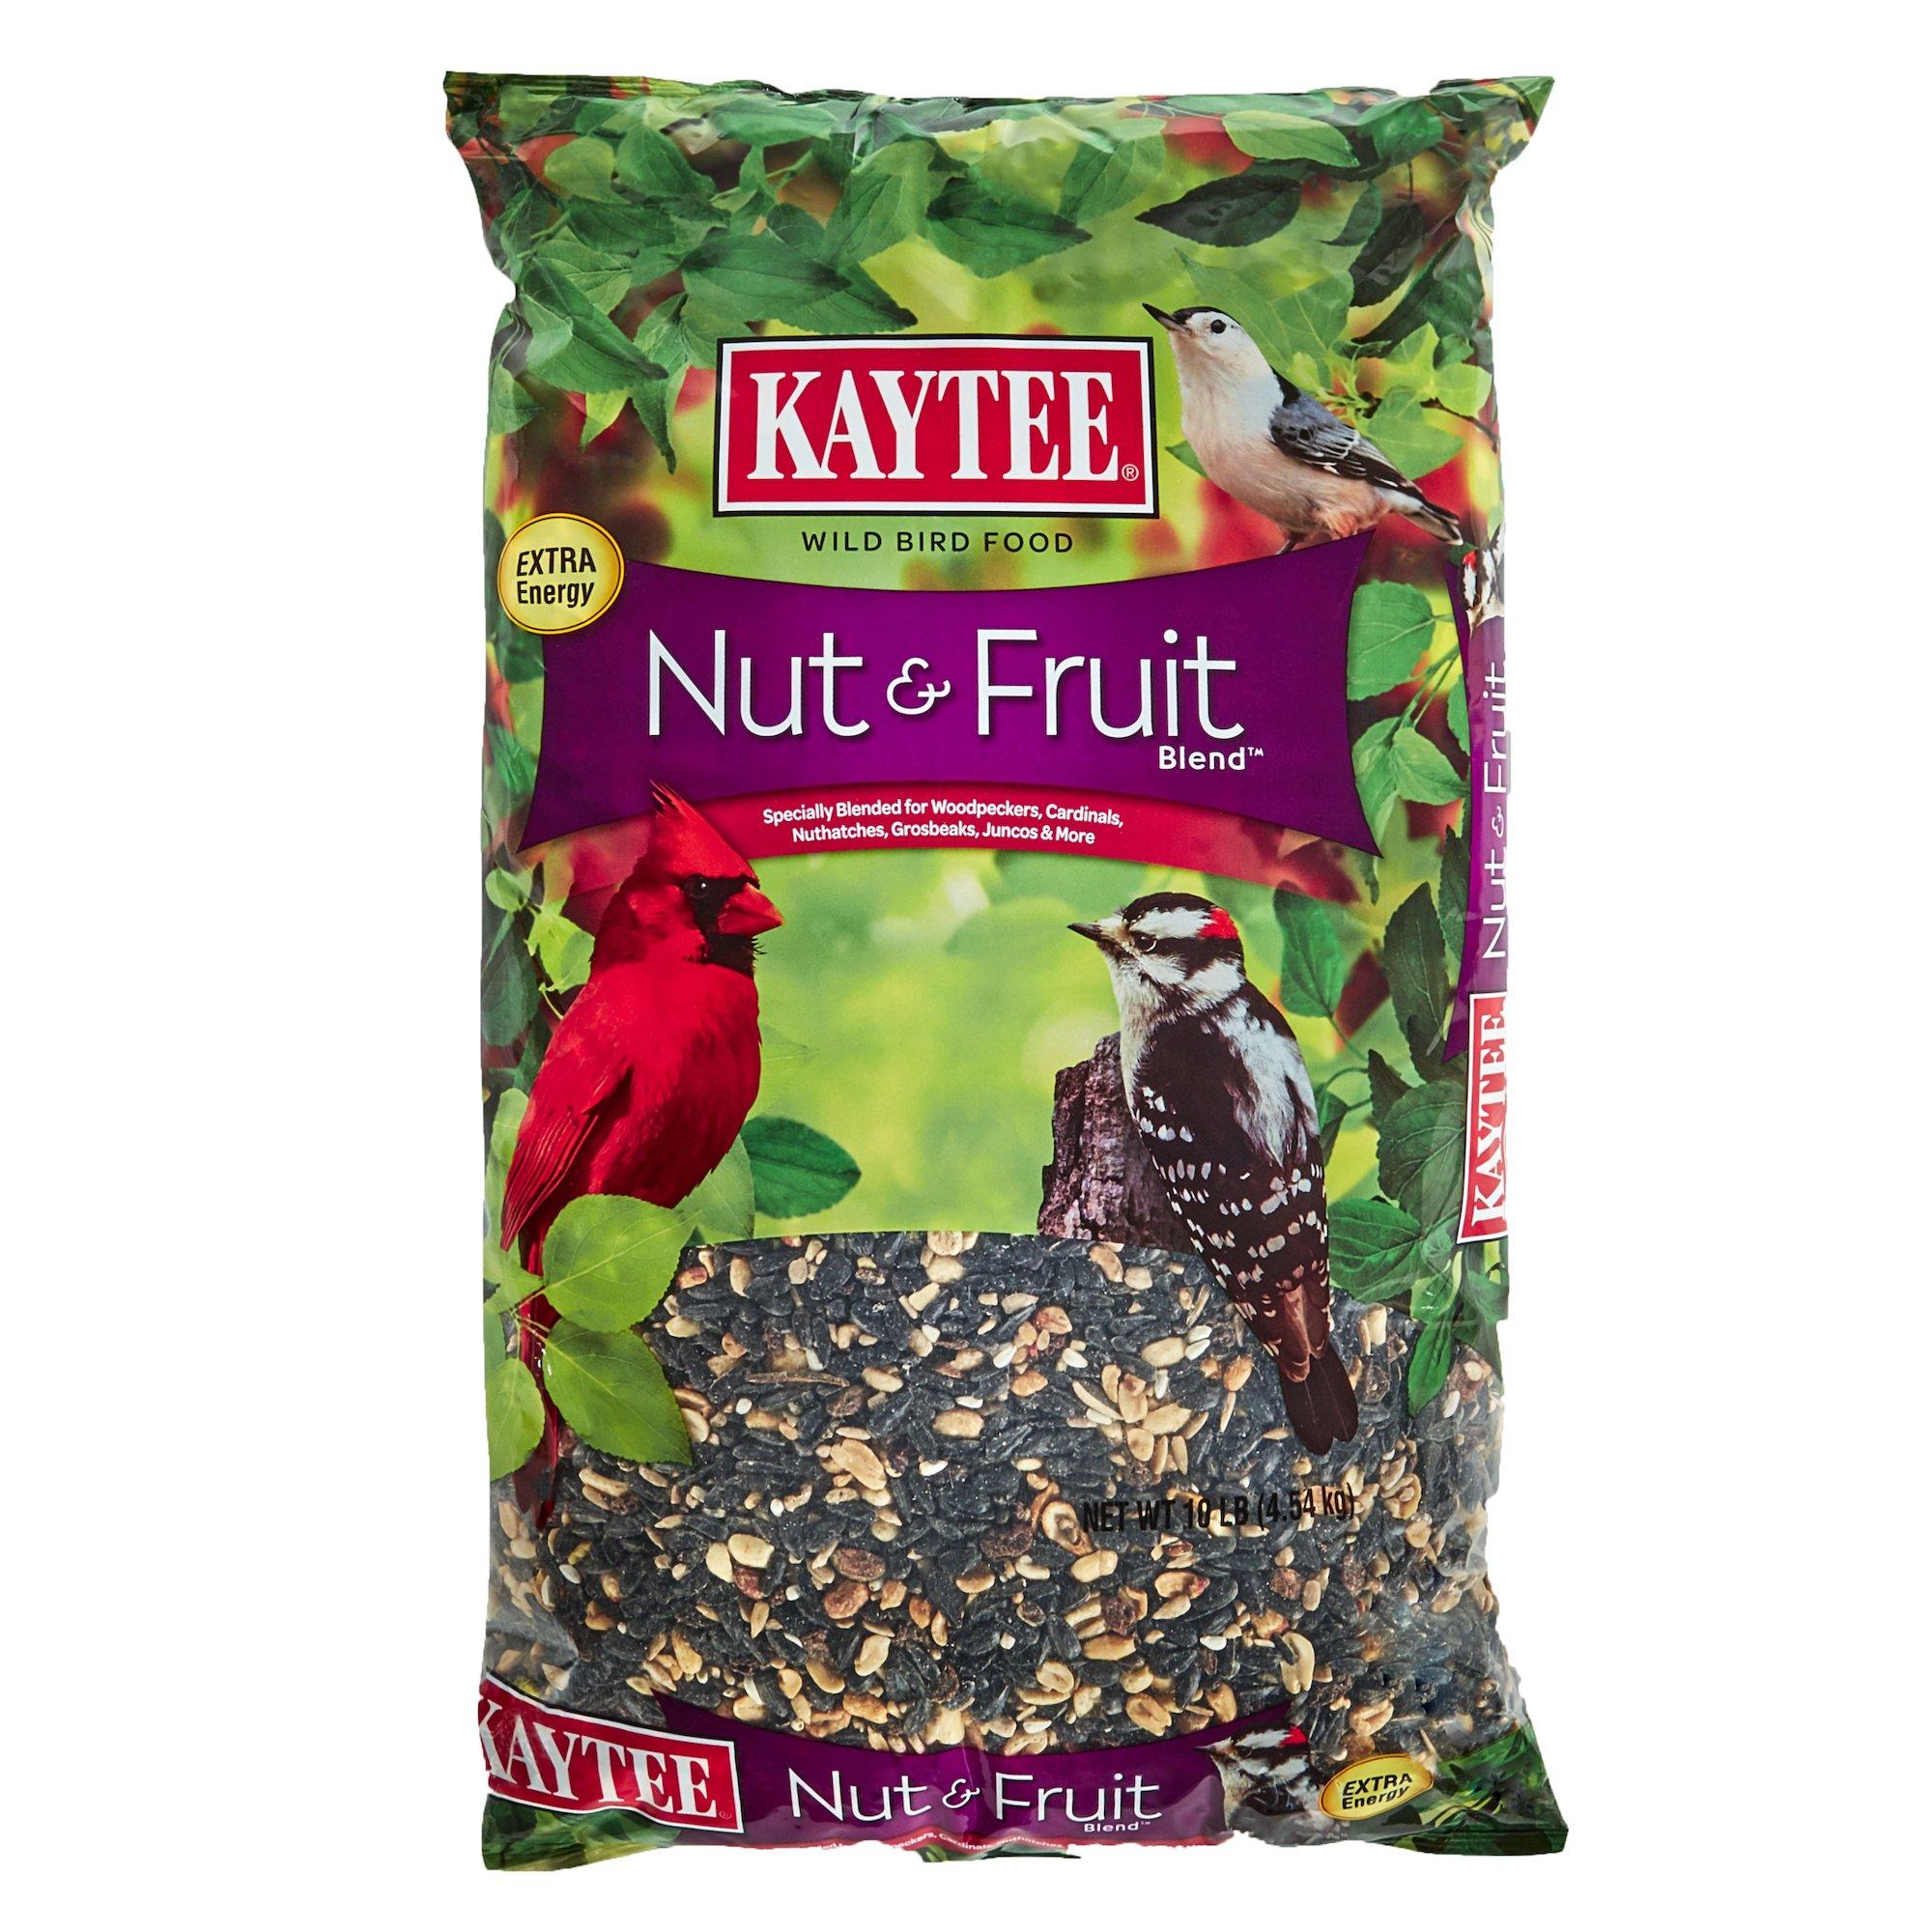 Kaytee Nut and Fruit Blend, 10-Pound Bag